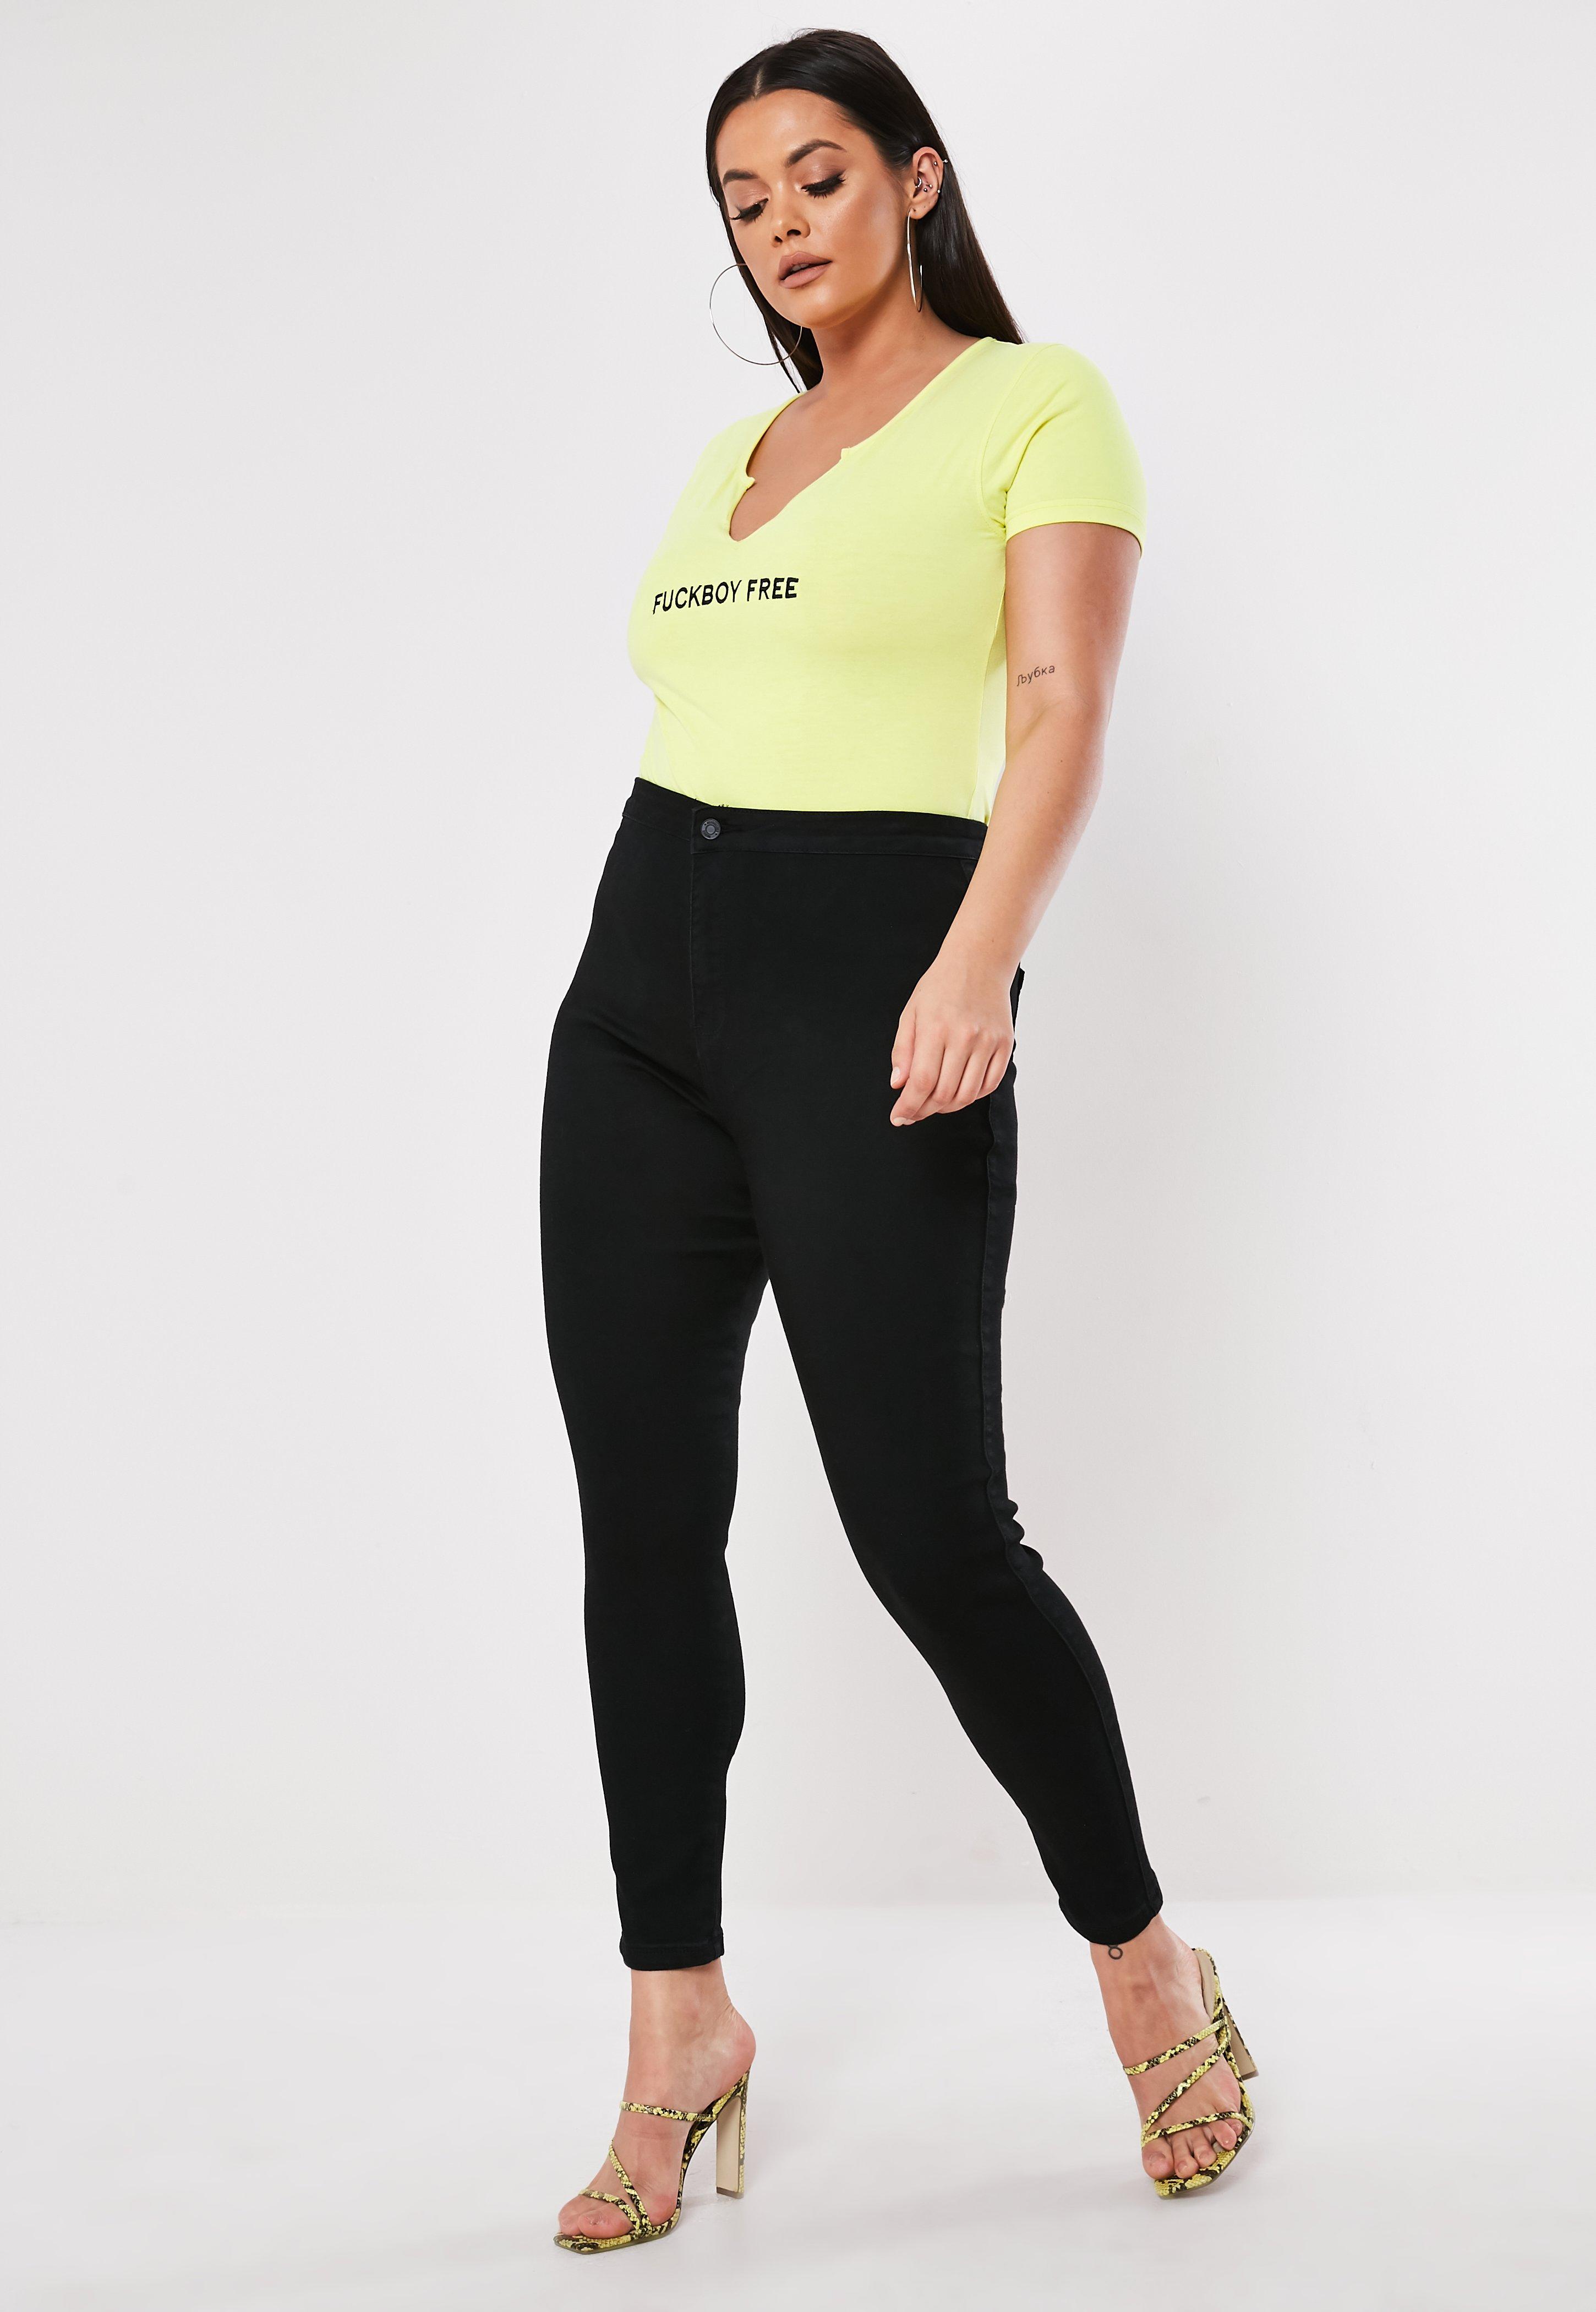 7e0a3ac8cfa Plus Size Clothing   Plus Size Womens Fashion - Missguided+